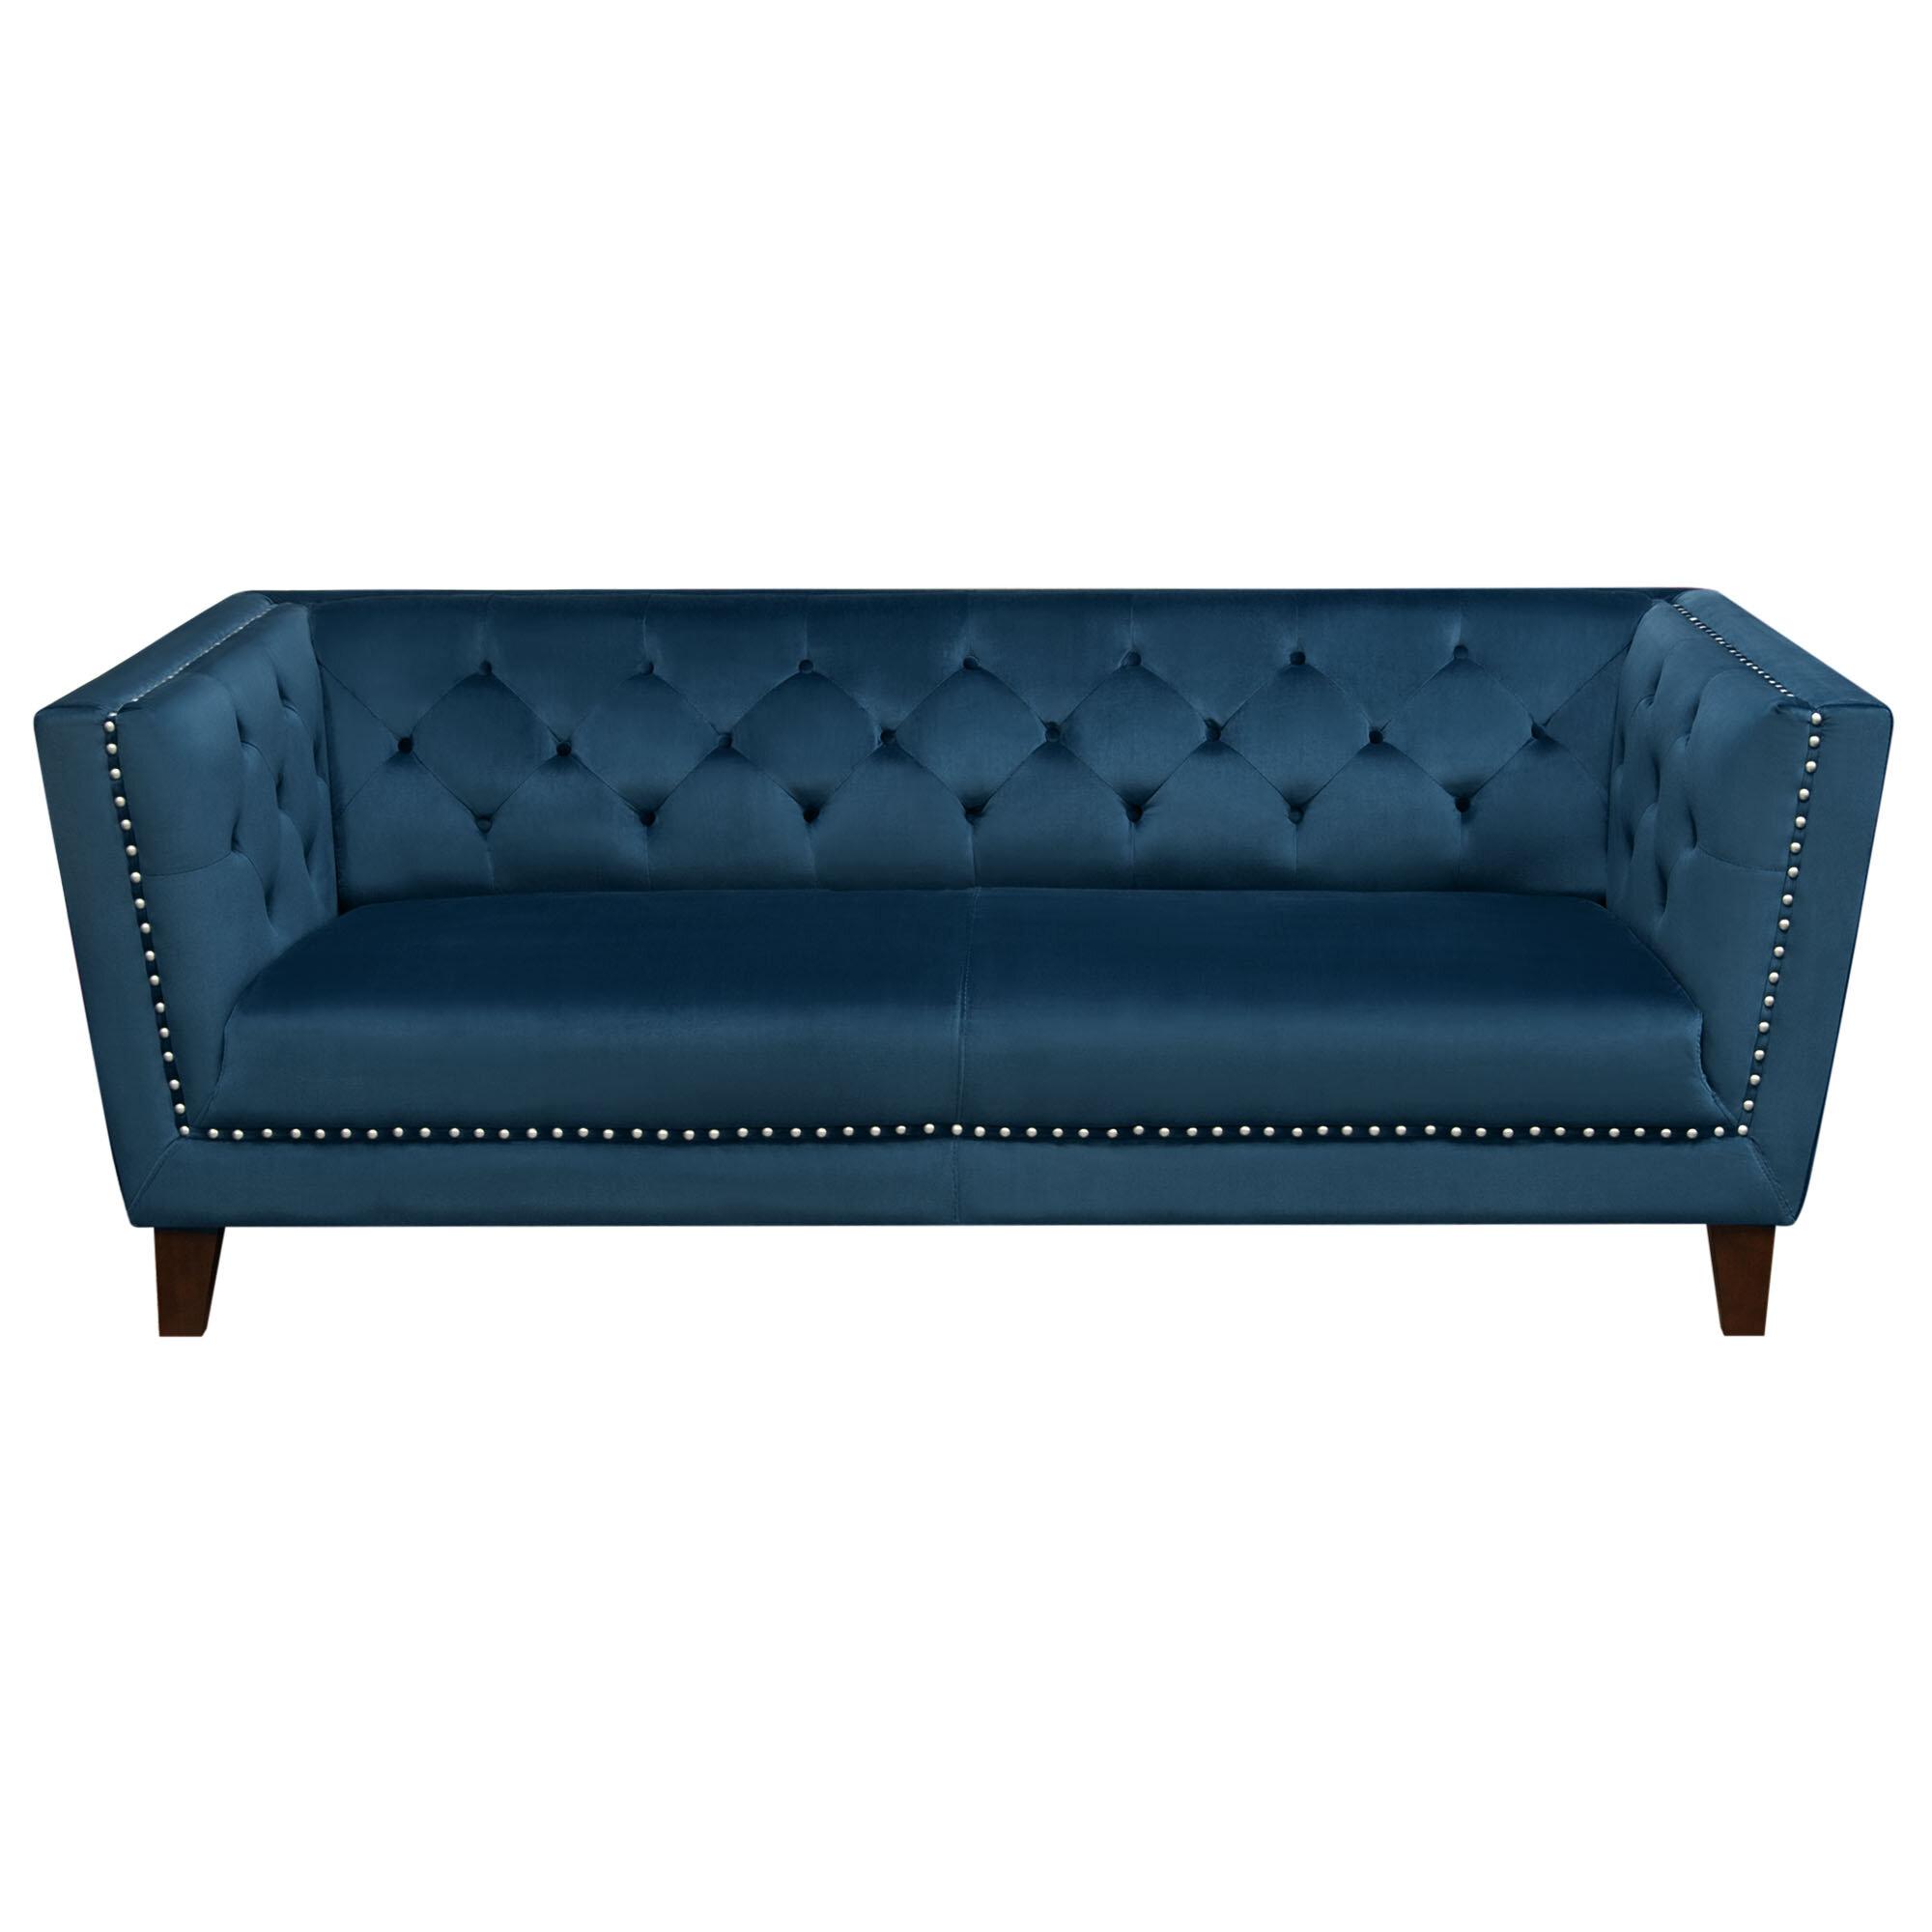 Beau Diamond Sofa Grand Tufted Back Standard Sofa | Wayfair